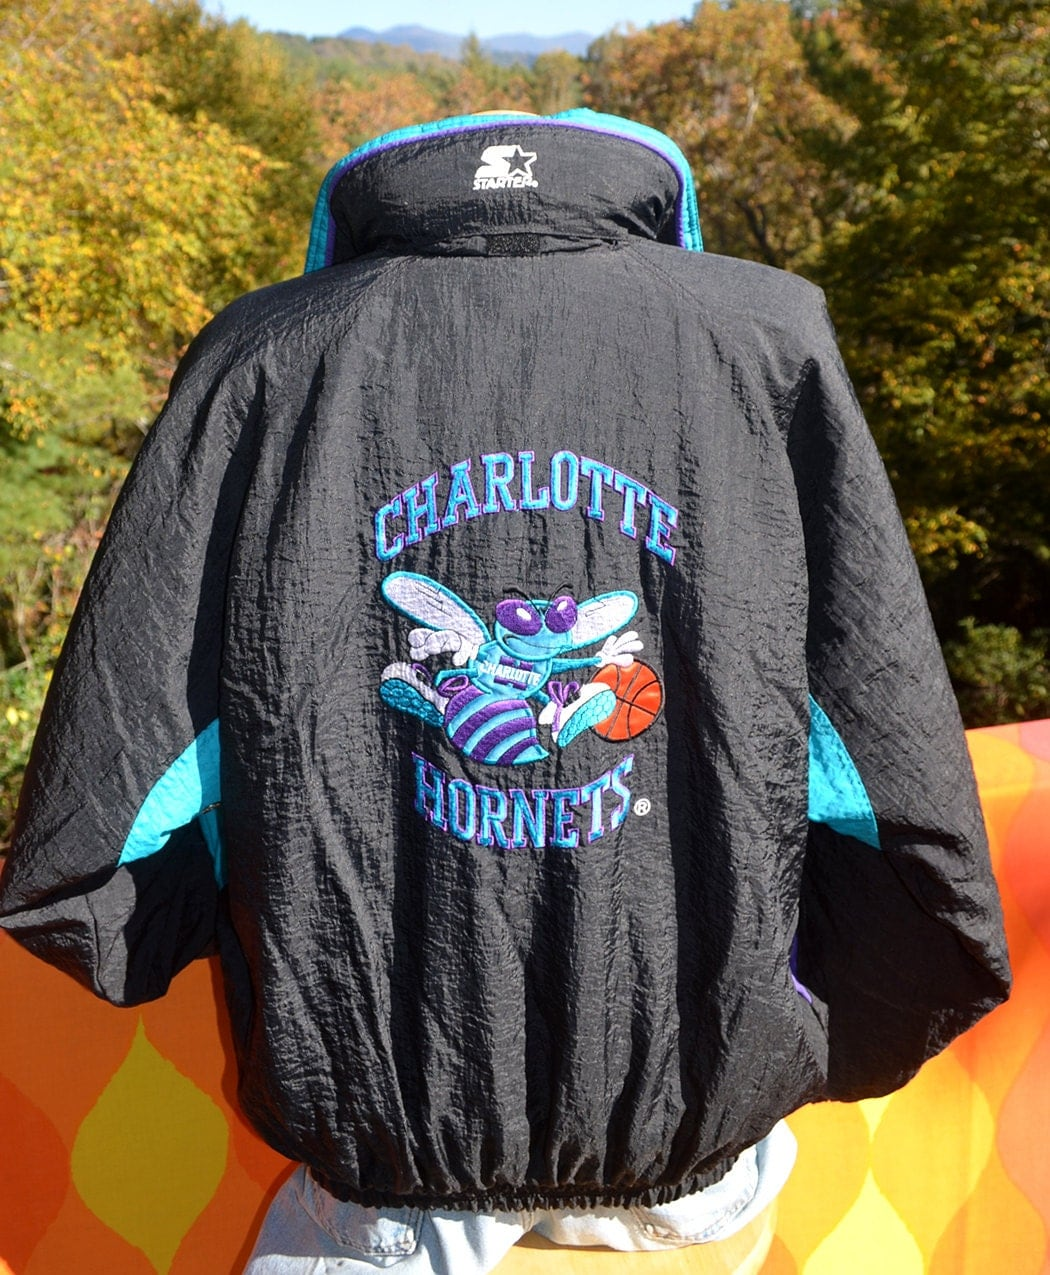 https://www.etsy.com/listing/166596962/vintage-90s-starter-jacket-charlotte